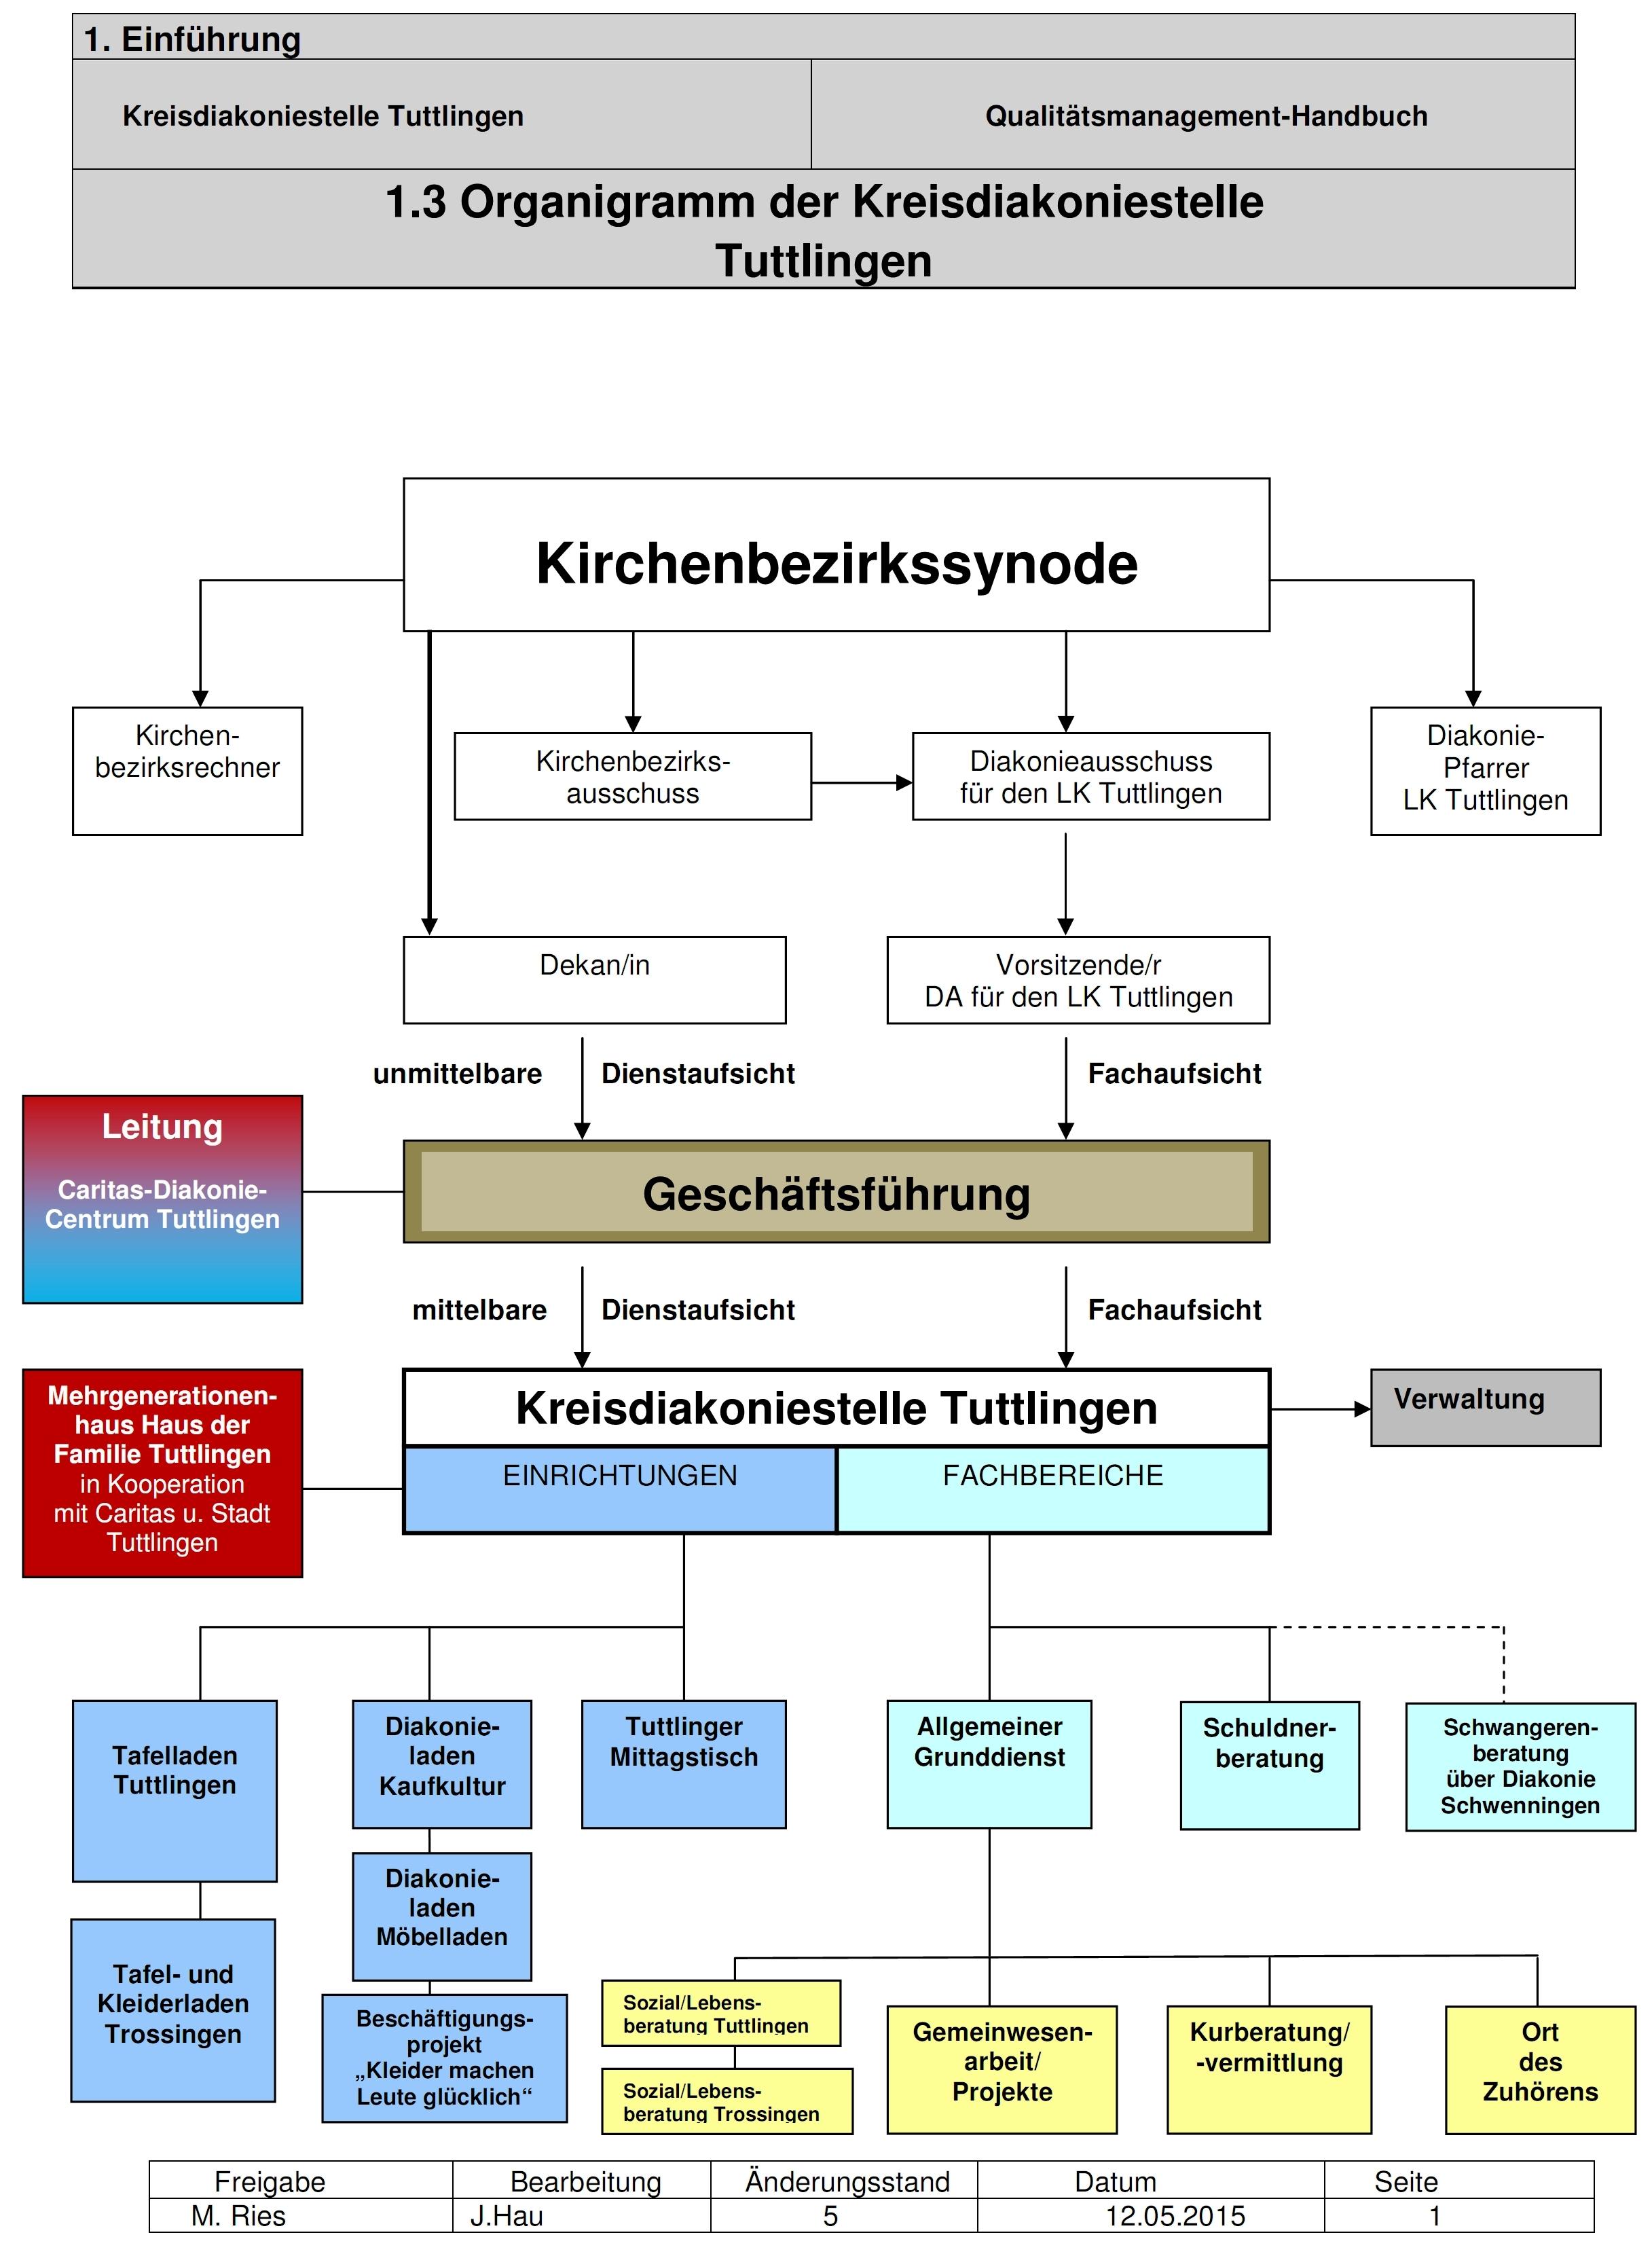 Organisation : Kreisdiakoniestelle Tuttlingen